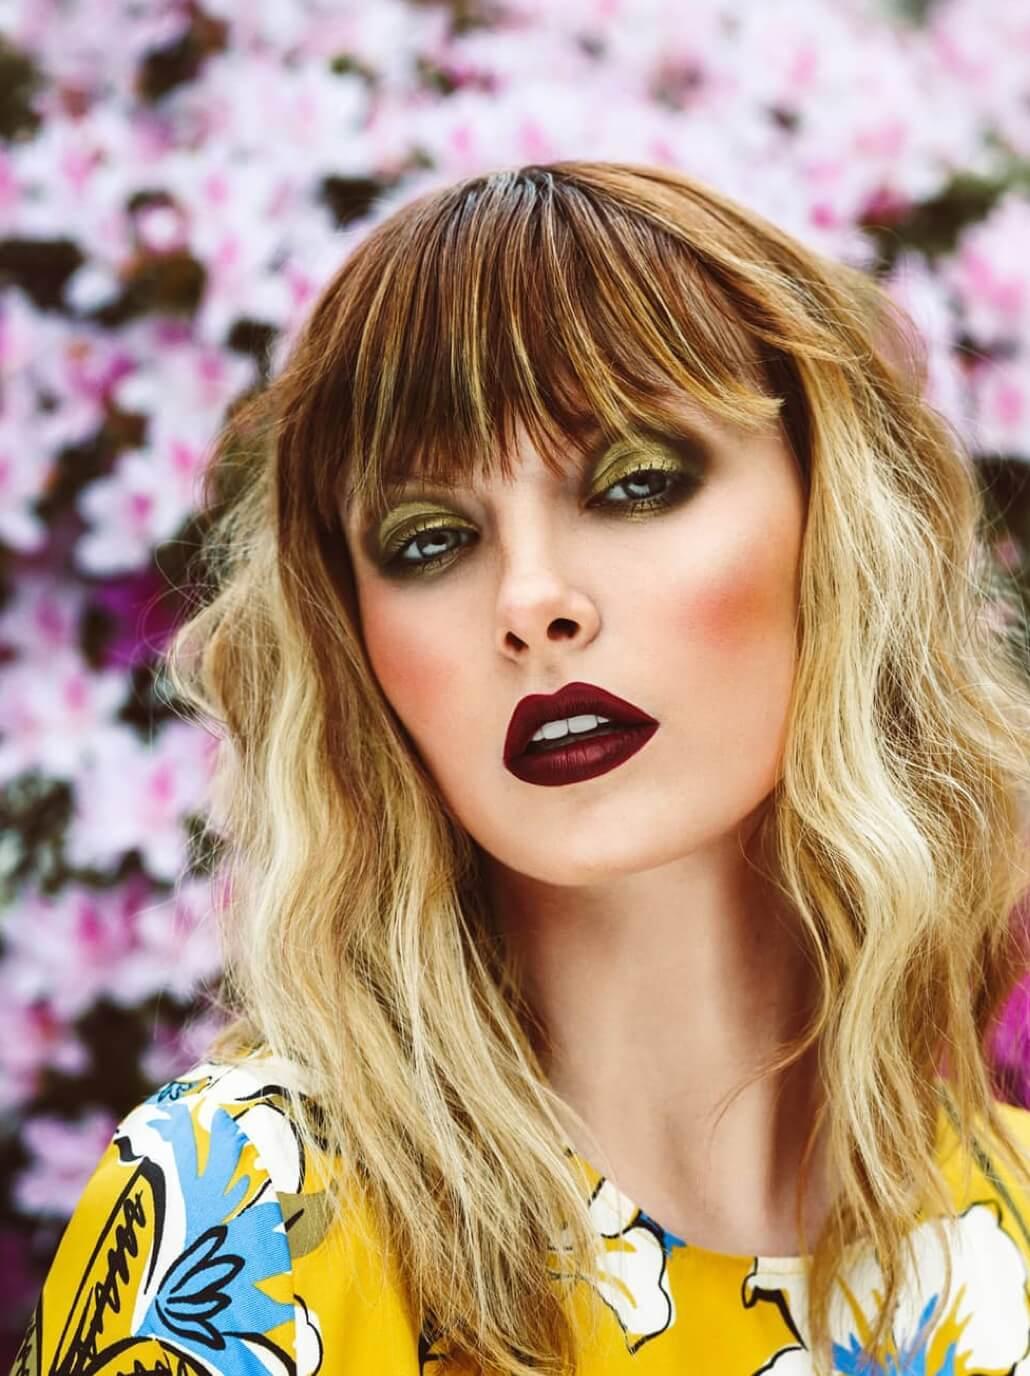 Model Sophia Andries